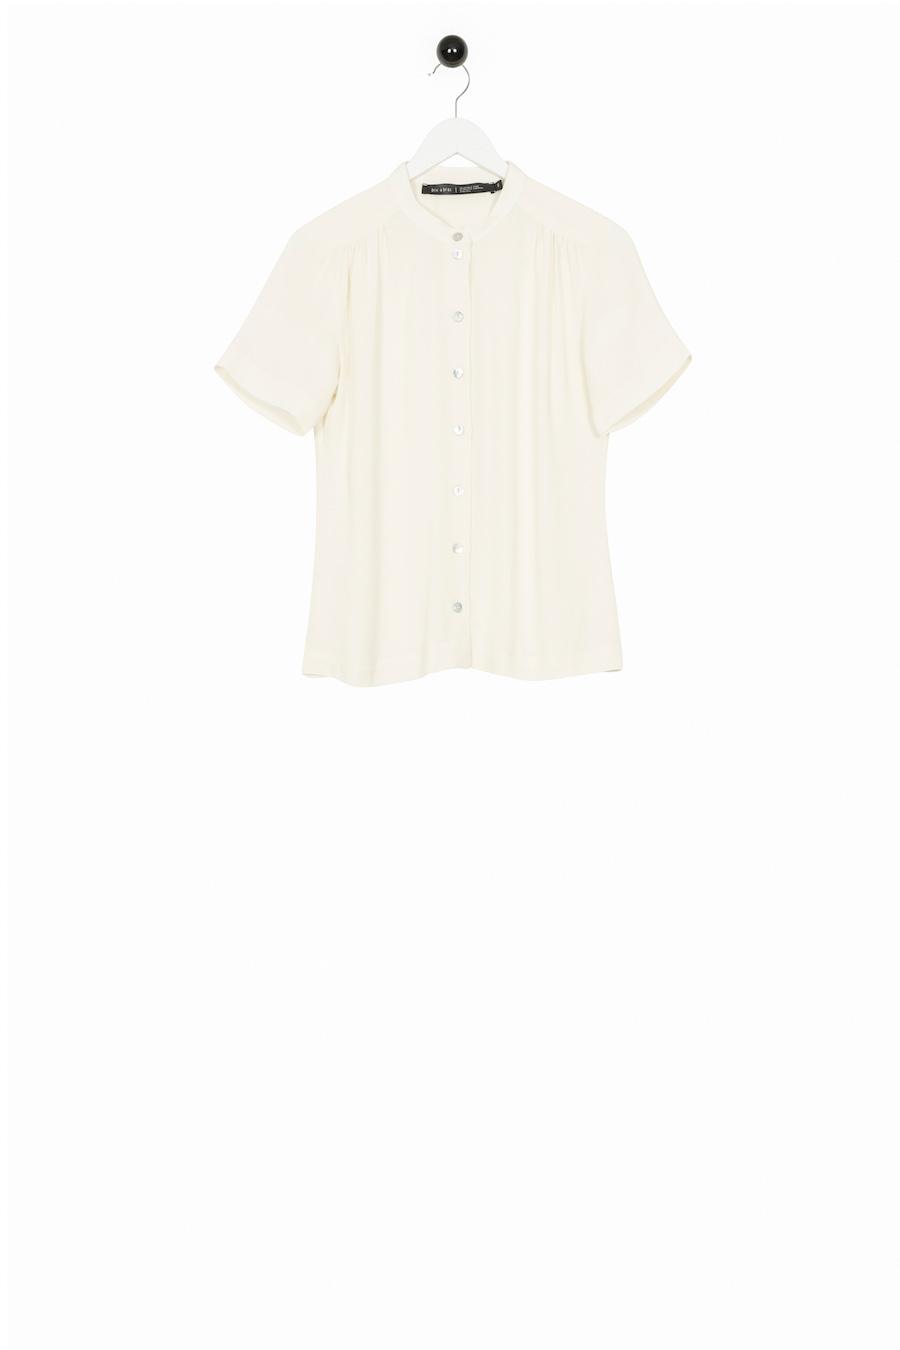 Ebenholts Blouse Short Sleeves